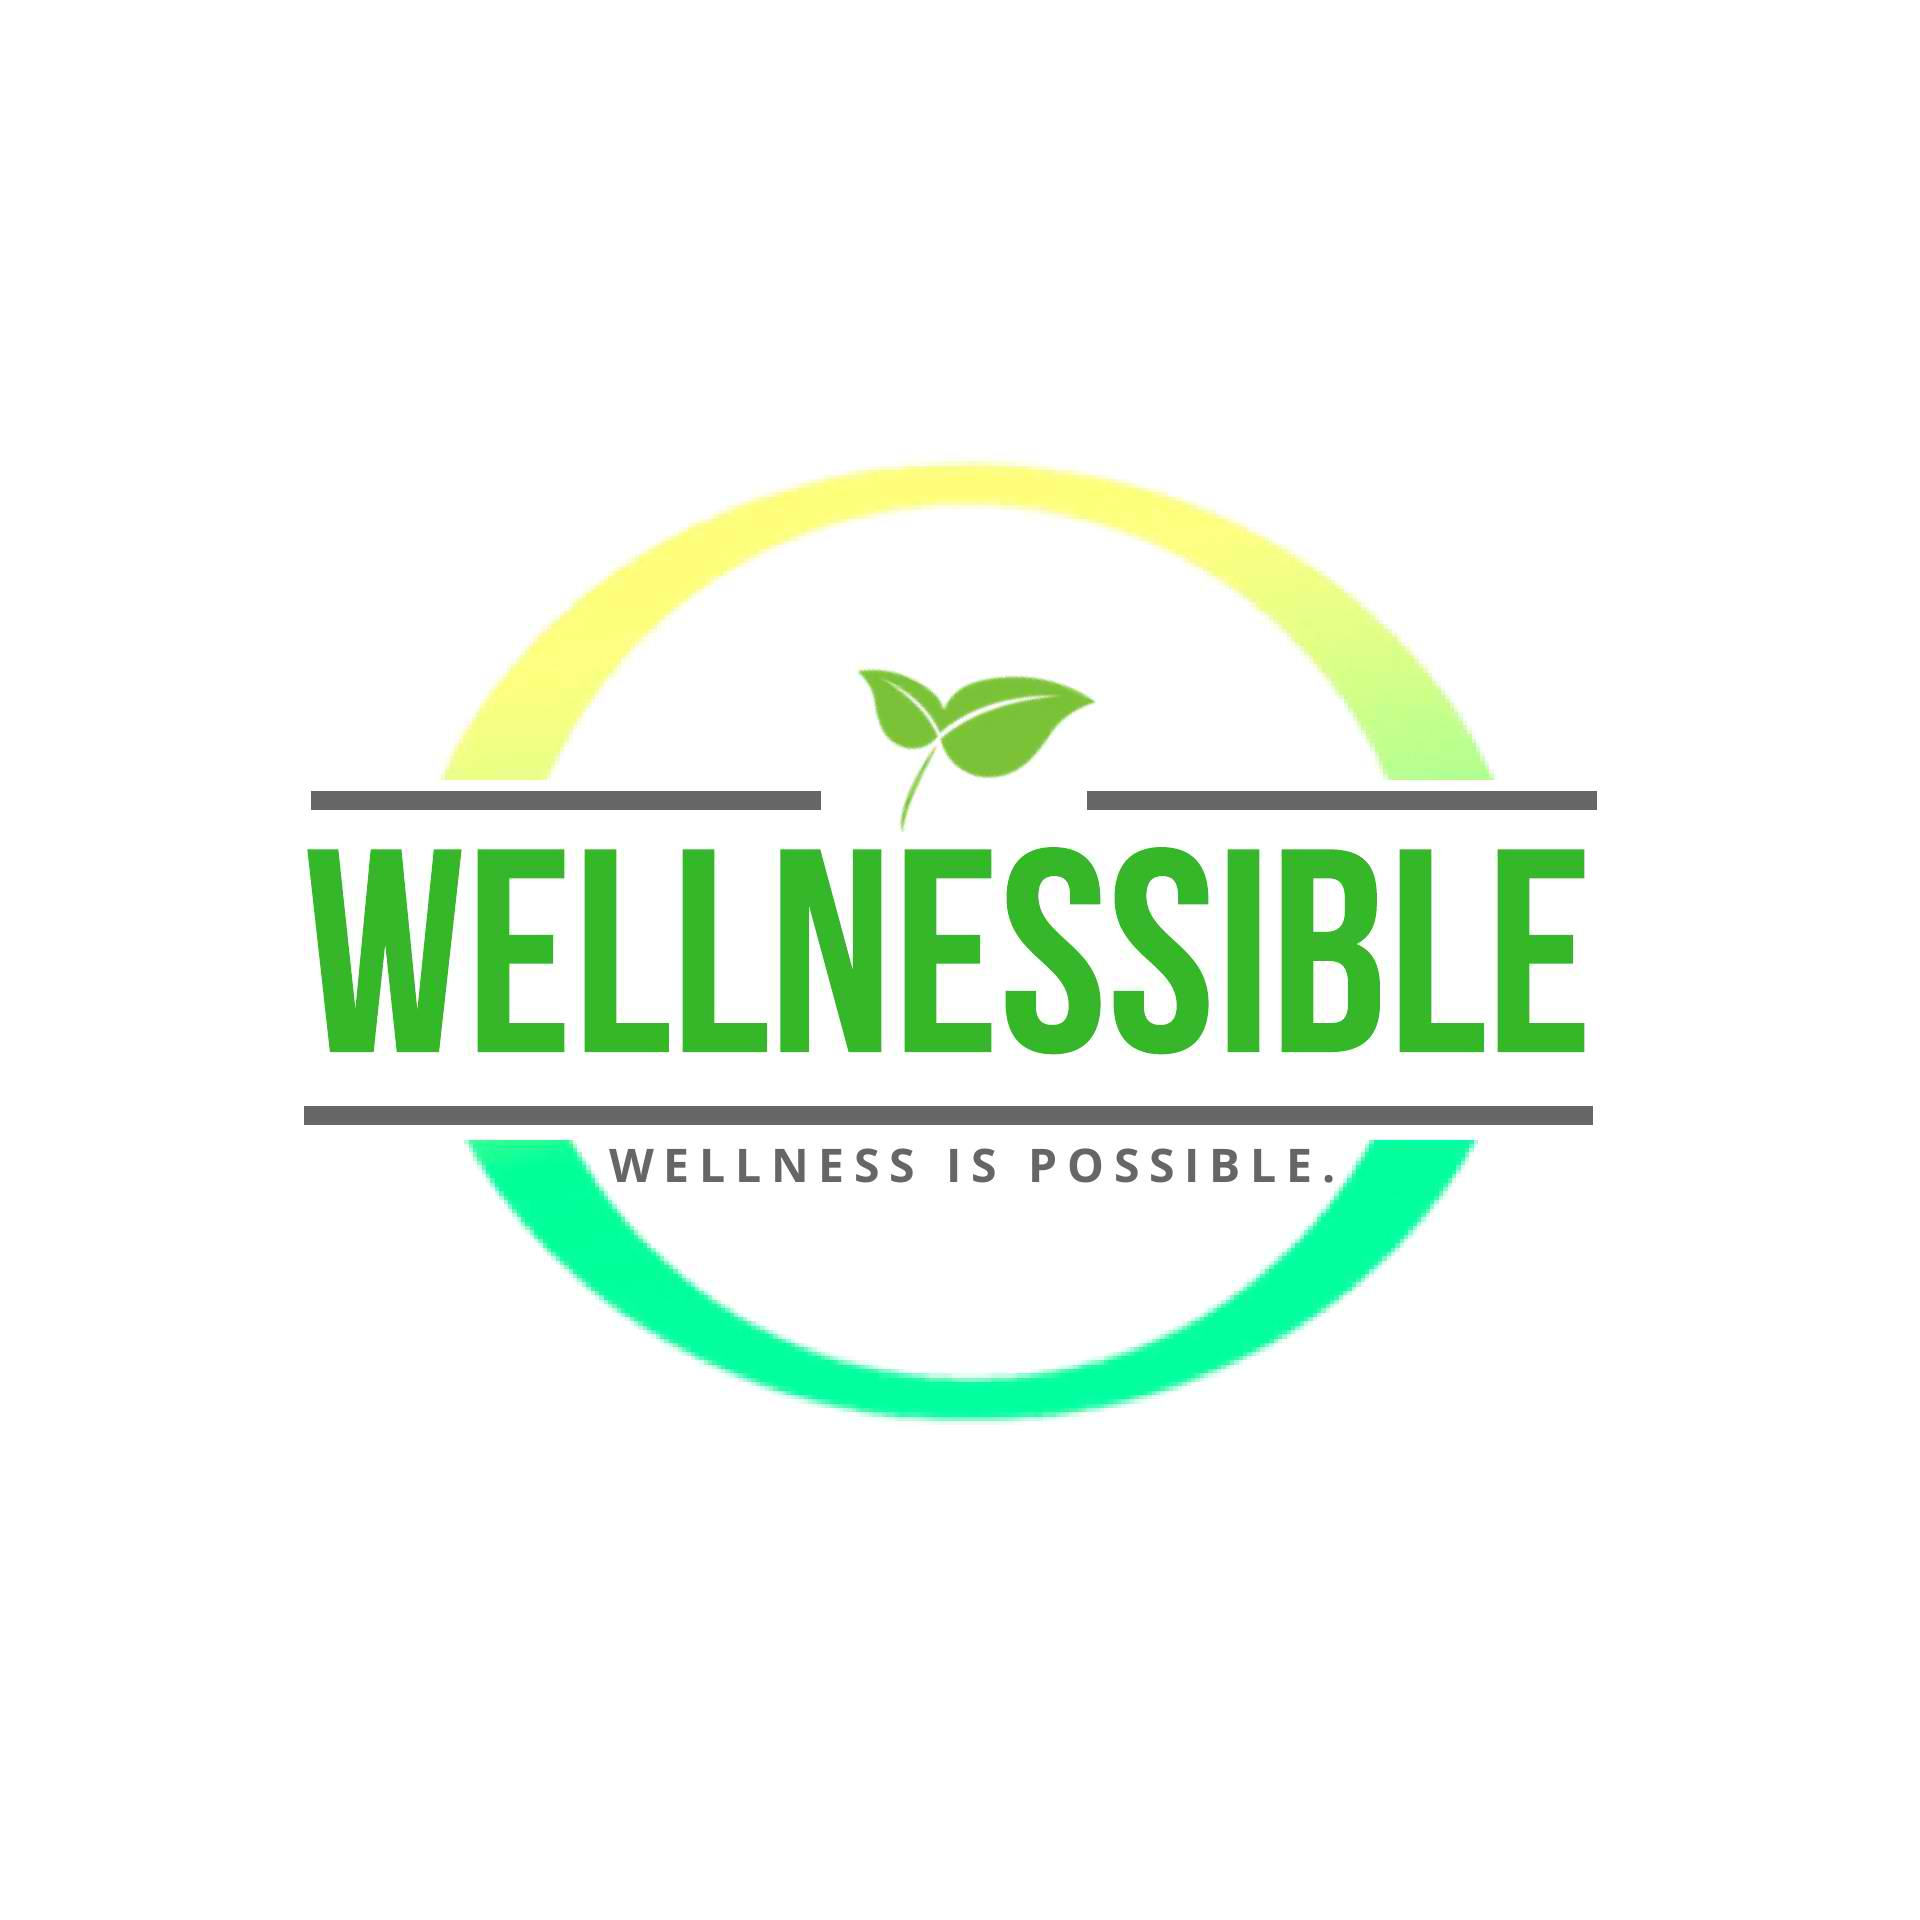 Wellnessible